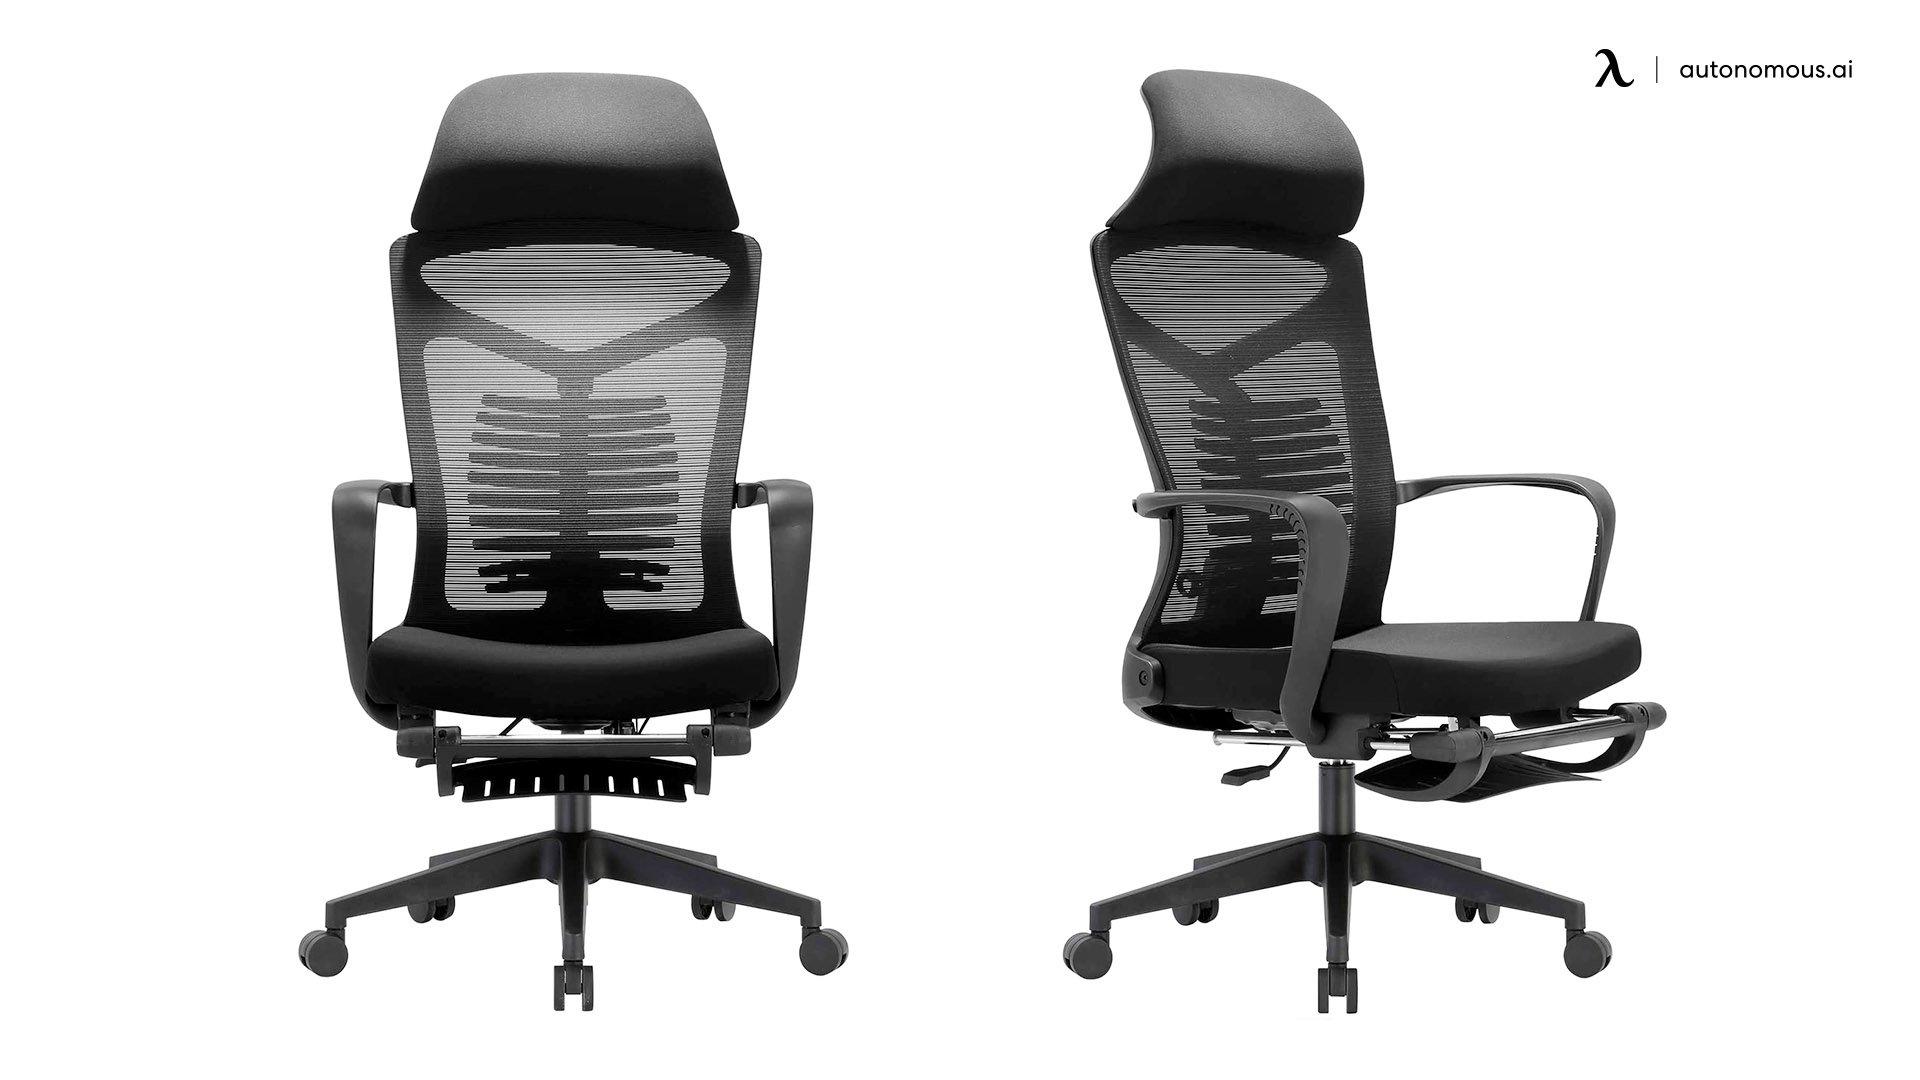 SIHOO Ergonomic Office Recliner Mesh Chair